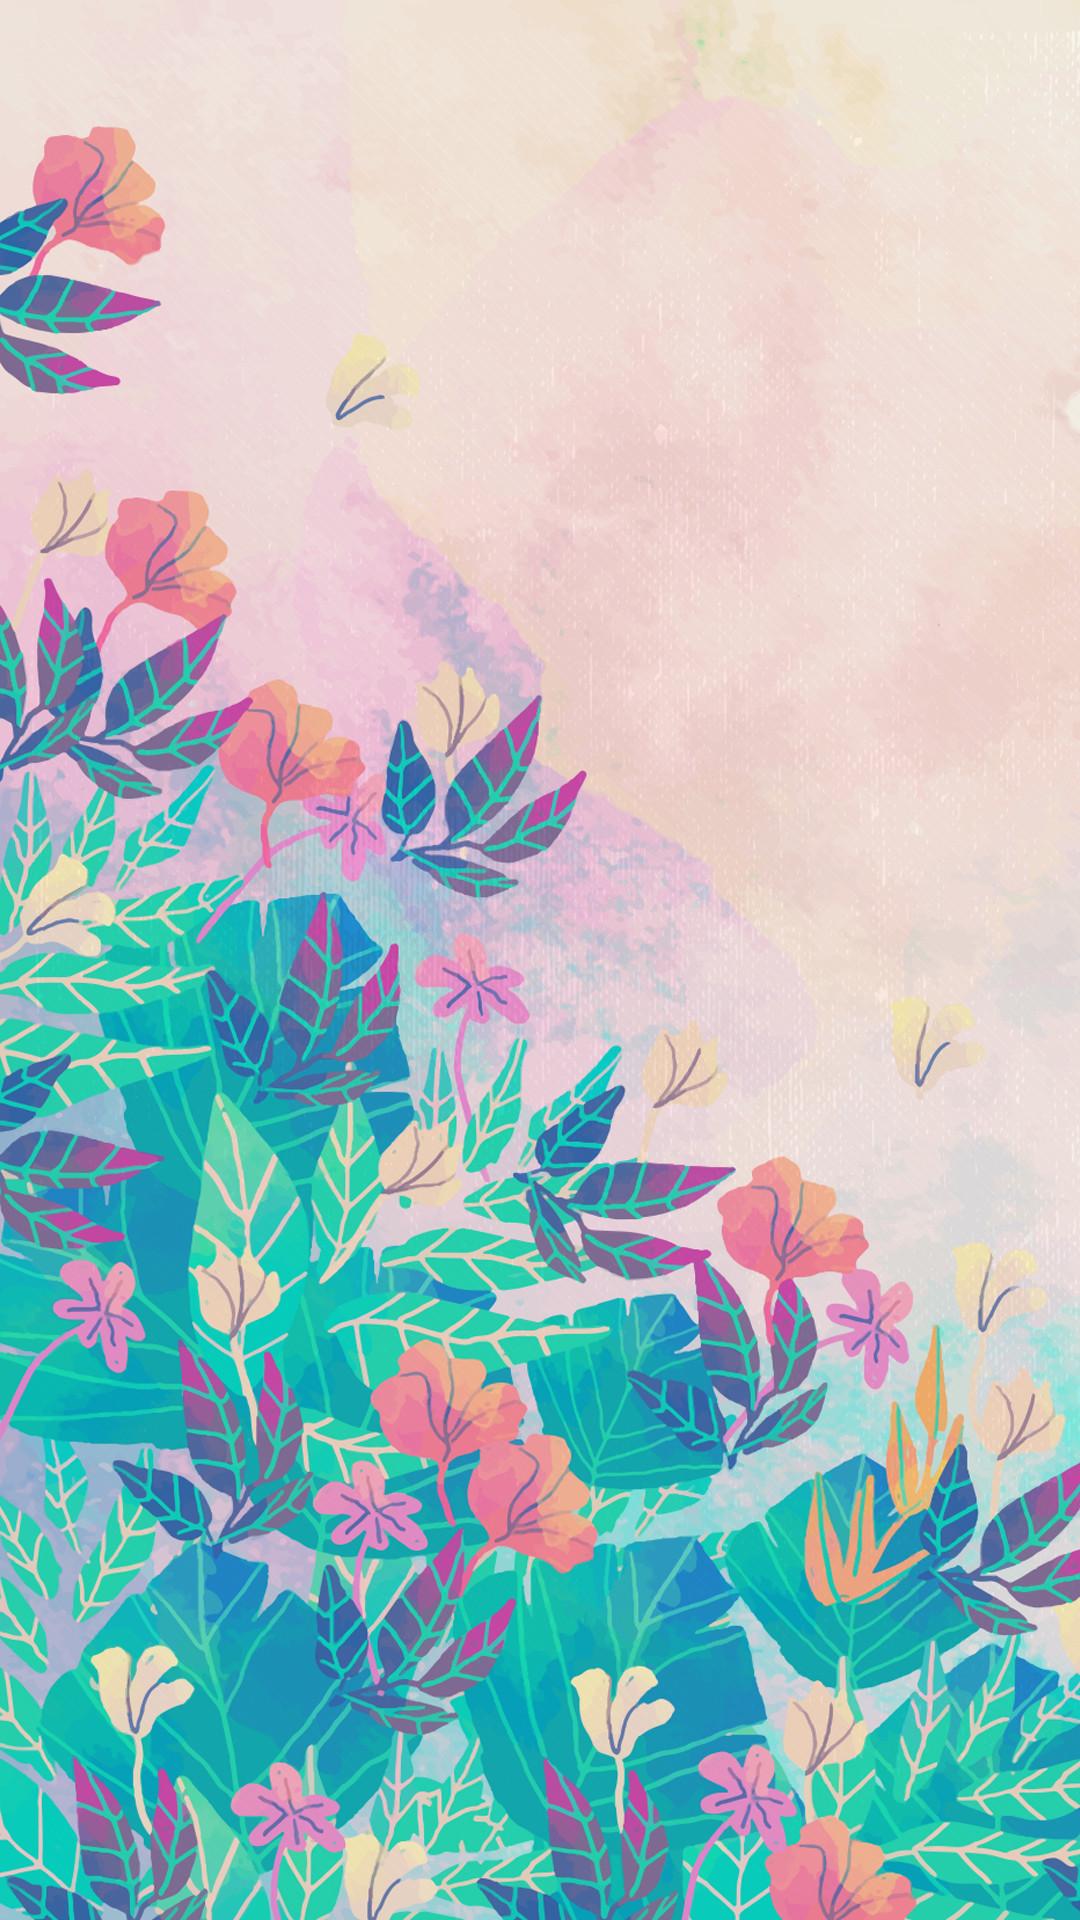 watercolor iphone wallpaper 72 images